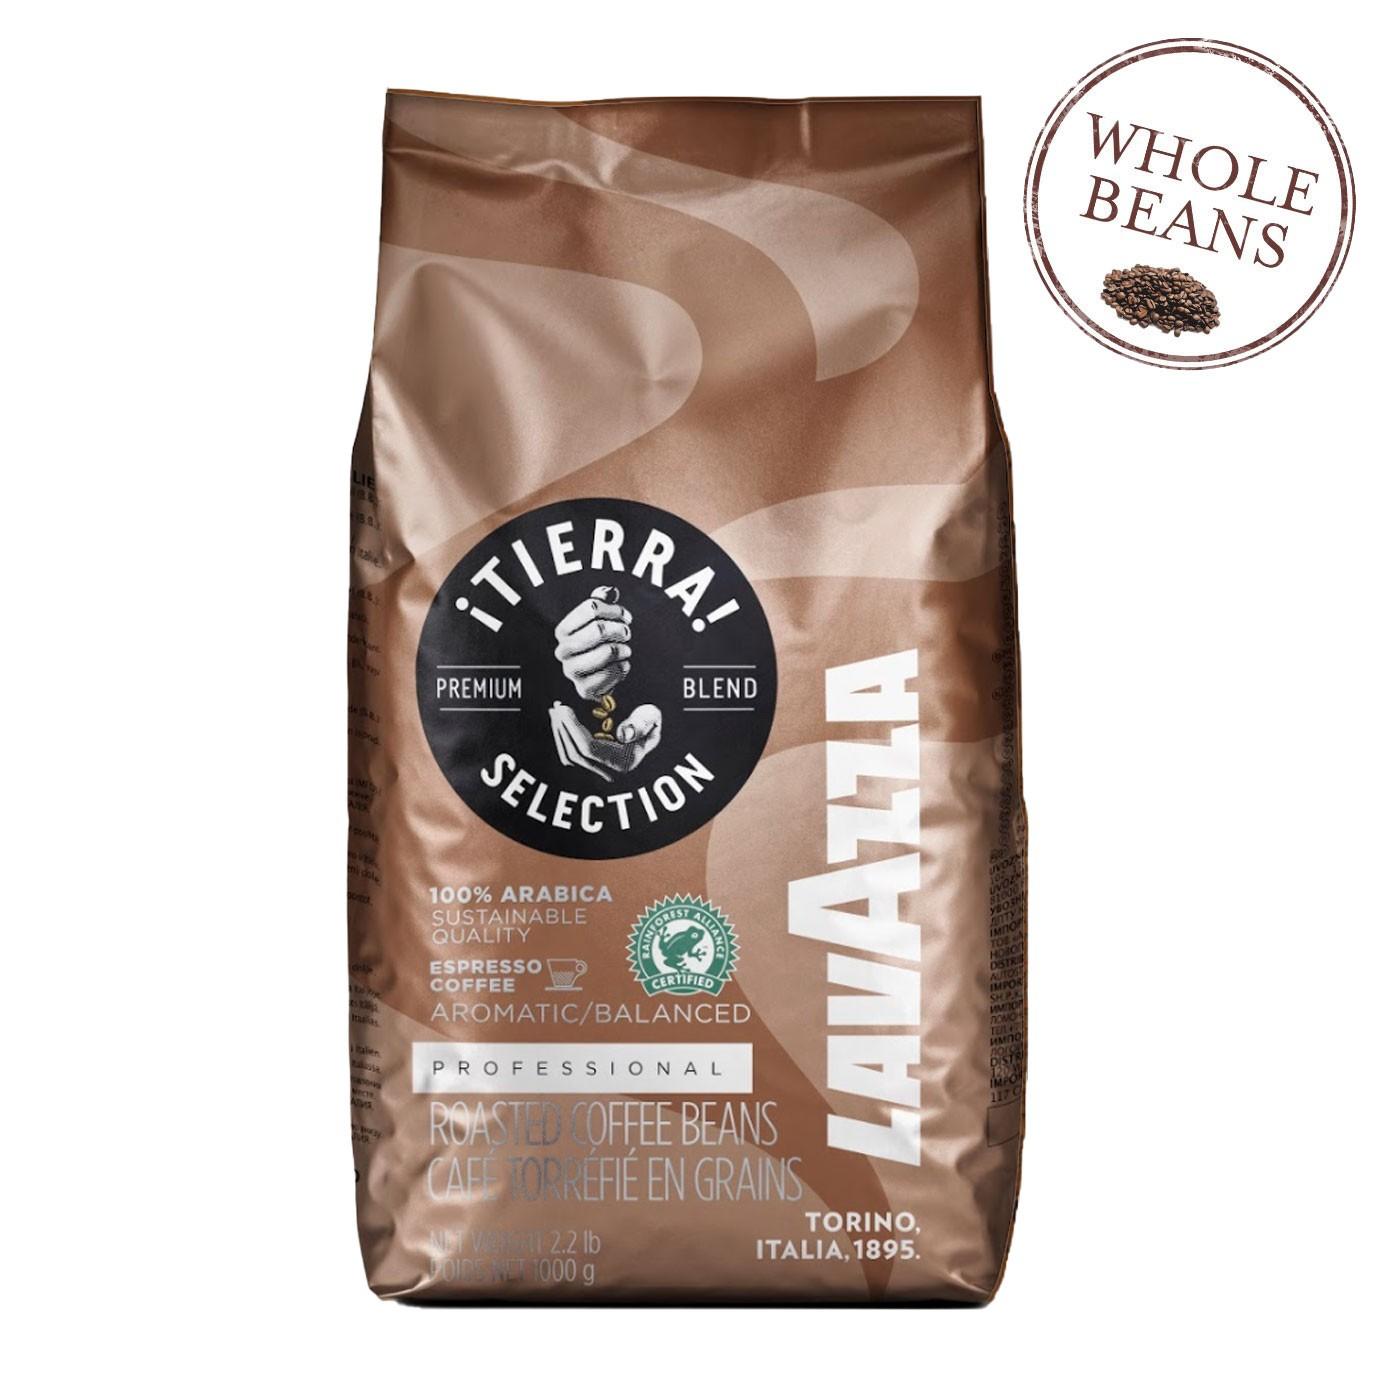 ¡Tierra! Selection Whole Beans 35.2 oz